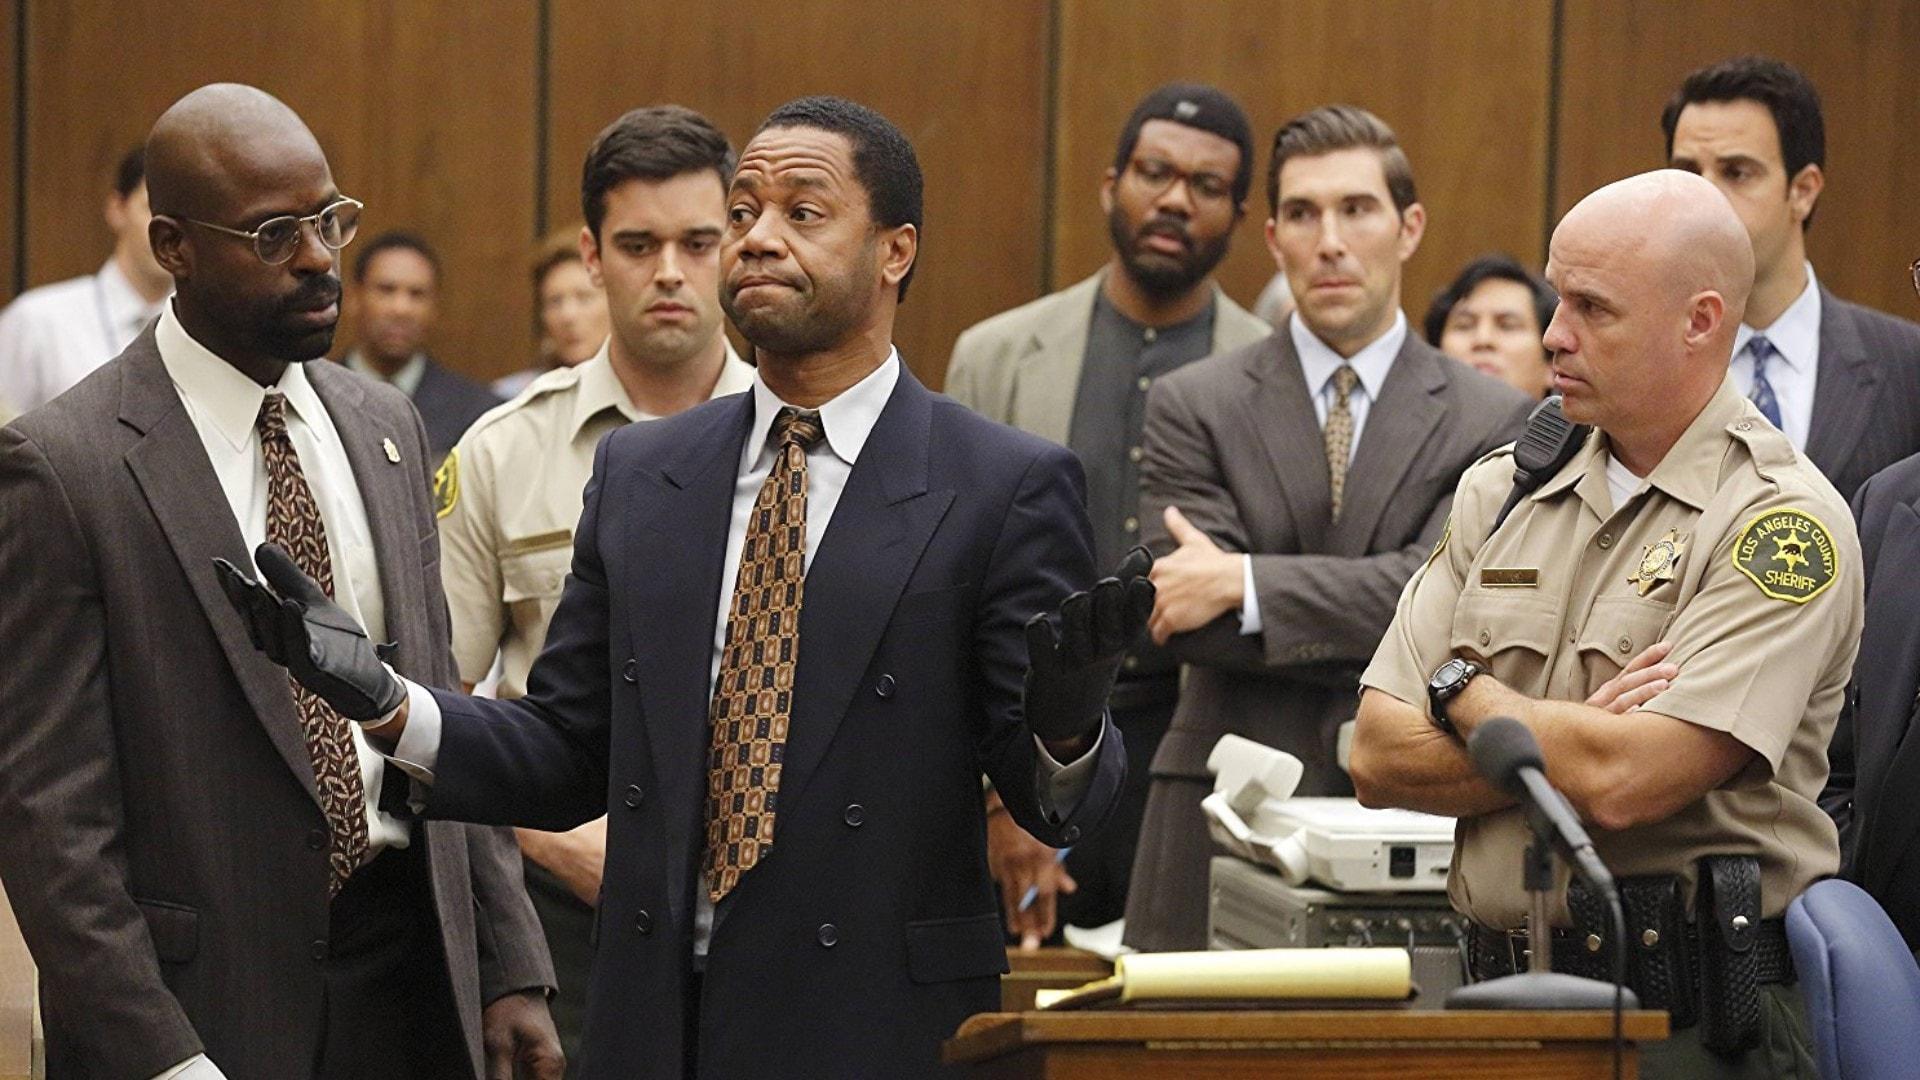 American Crime Story - Season 2 - Watch Free on 123Movies